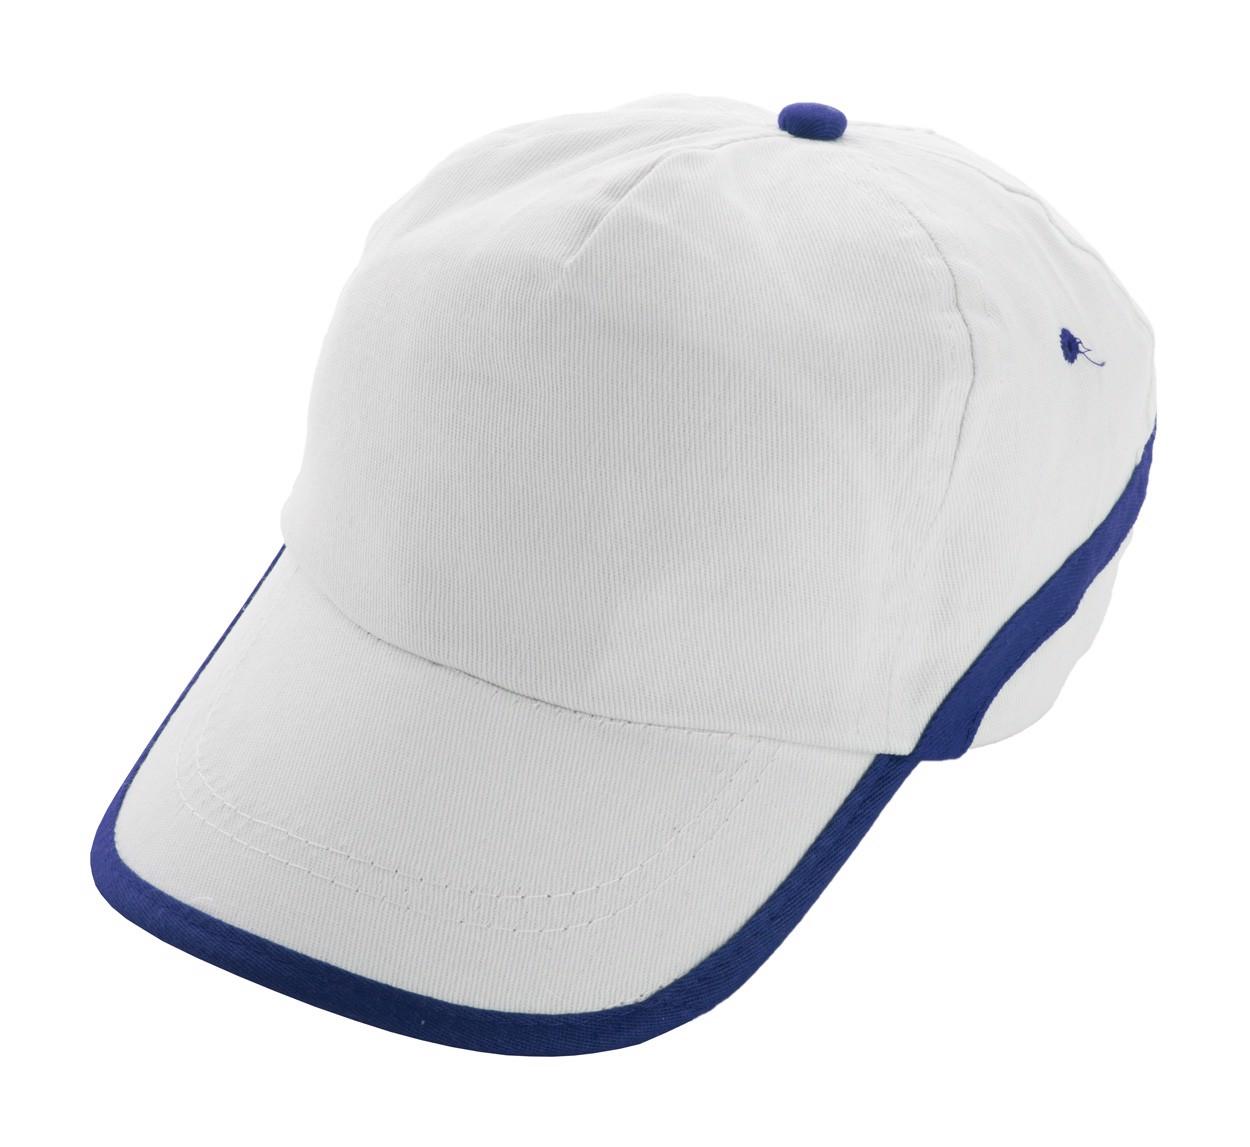 Baseballová Čepice Line - Bílá / Modrá